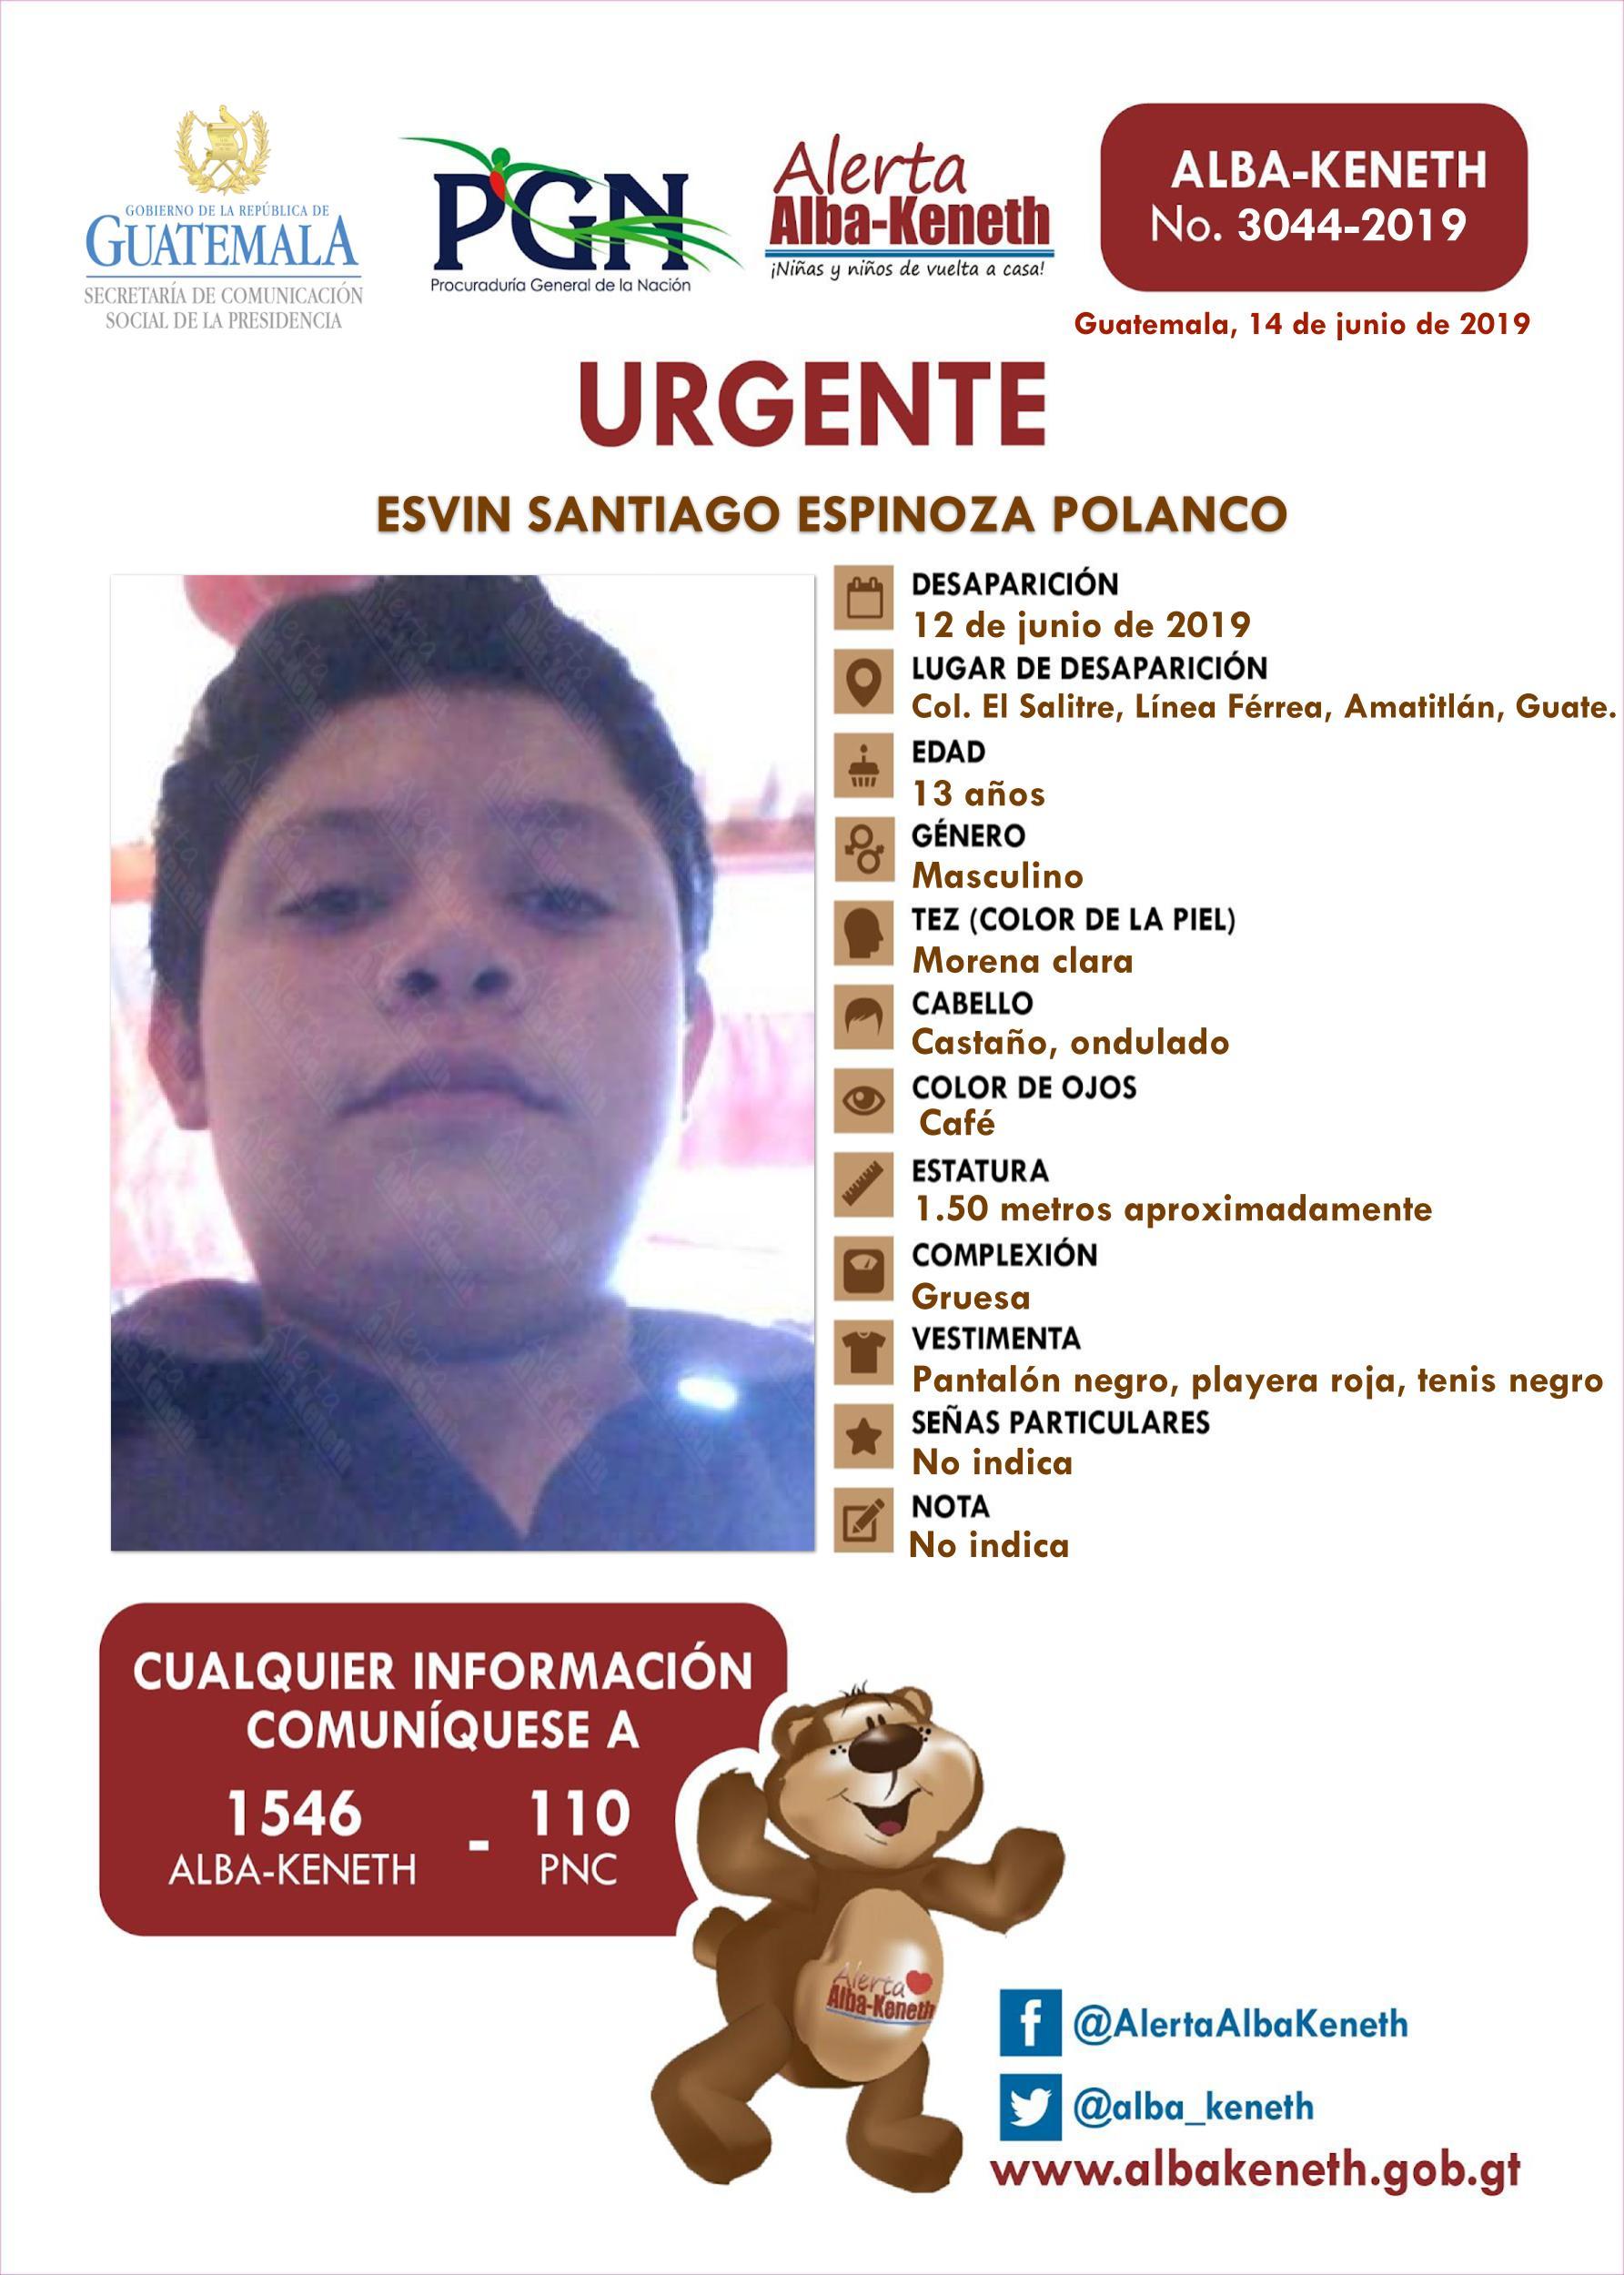 Esvin Santiago Espinoza Polanco